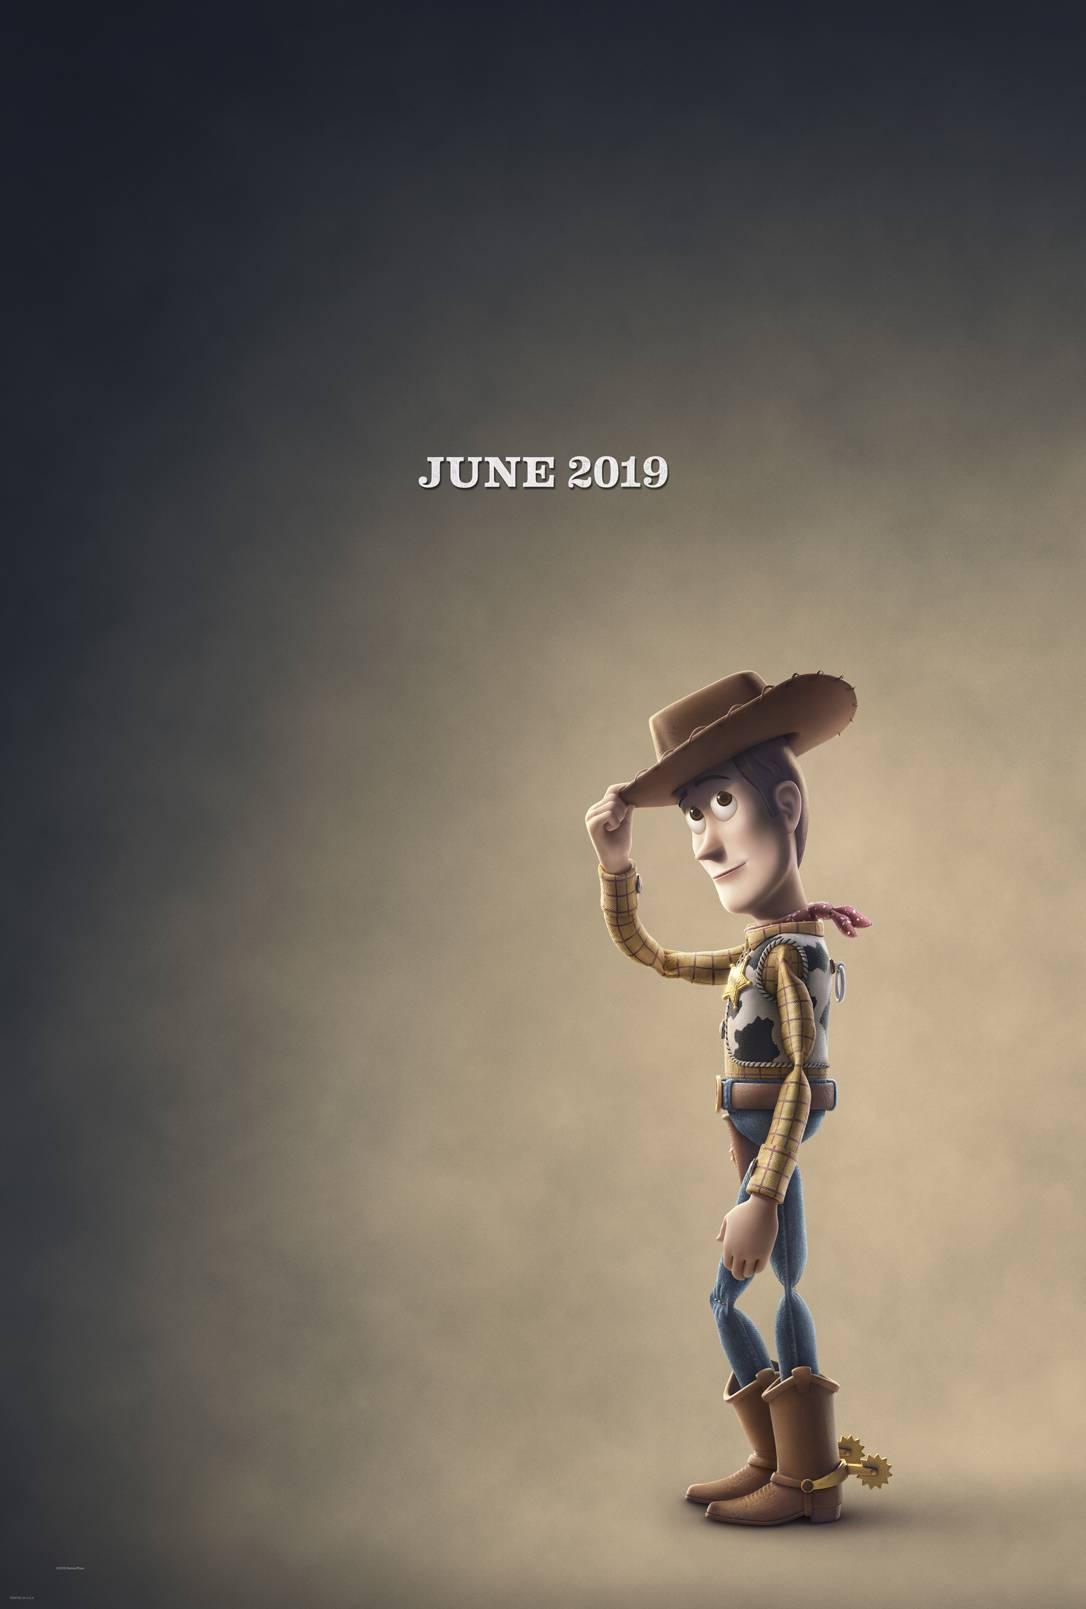 Toy Story 4: Νέα αφίσα και trailer! – Geekdom Cinema/TV